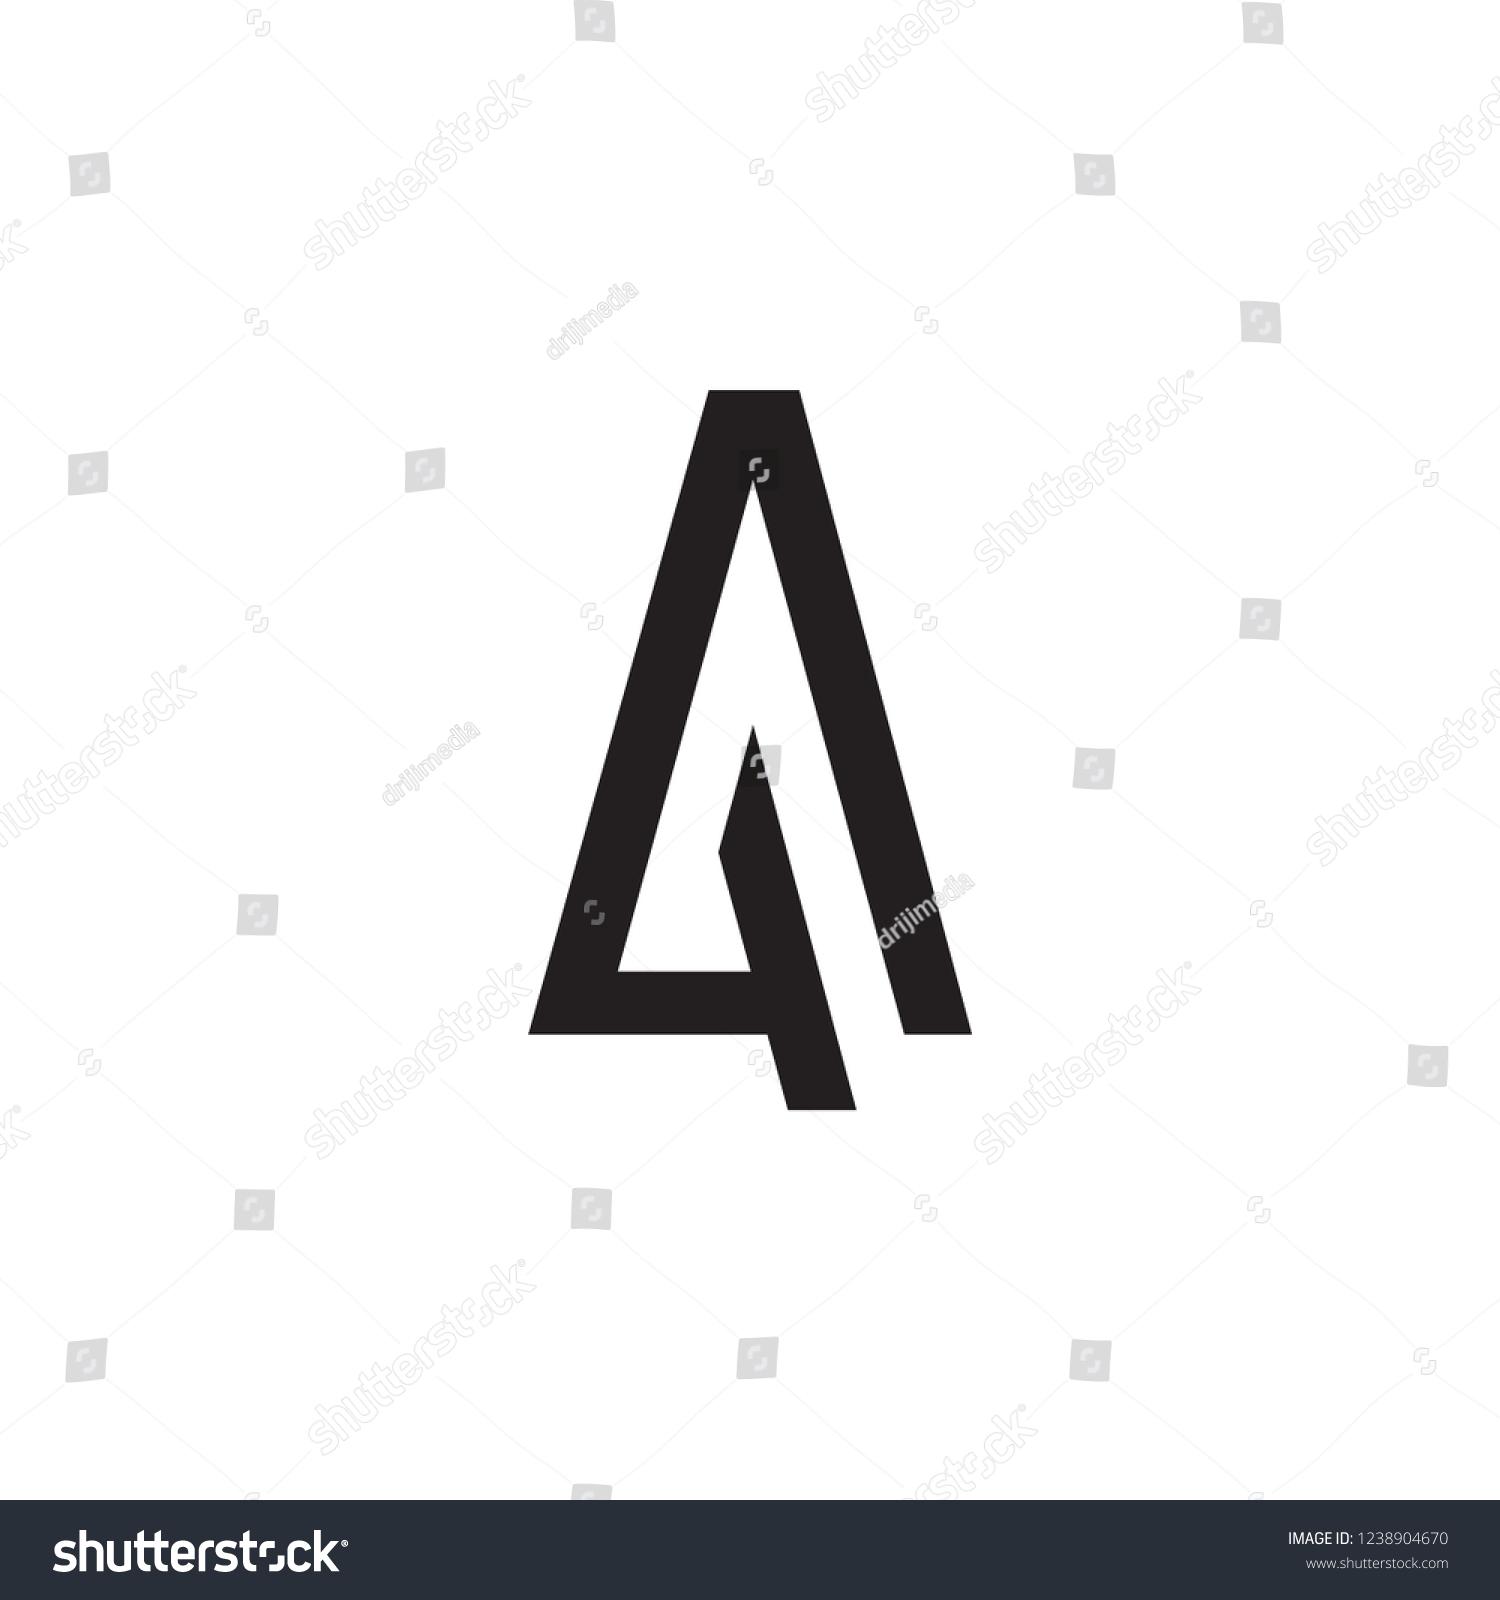 Aa and ag